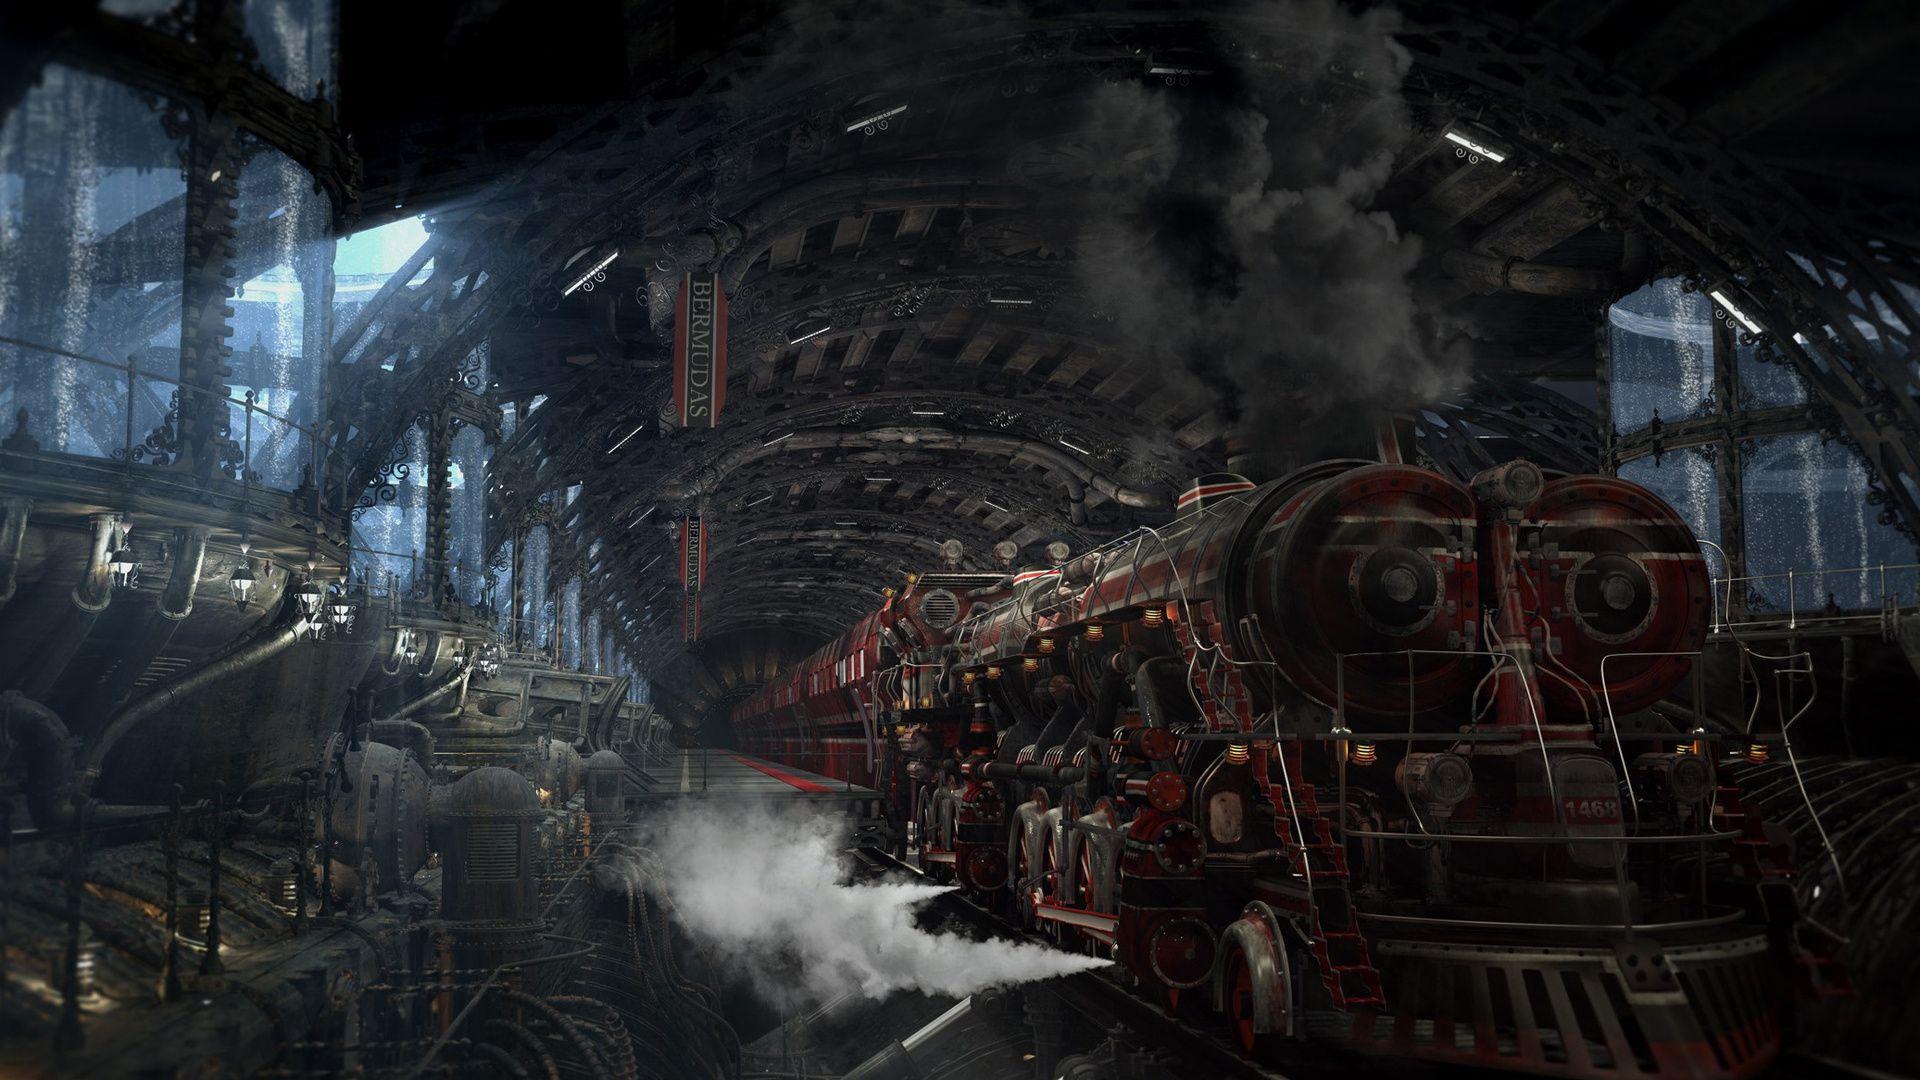 Hd Wallpapers Locomotive, Smoke, Station, Mechanisms Desktop